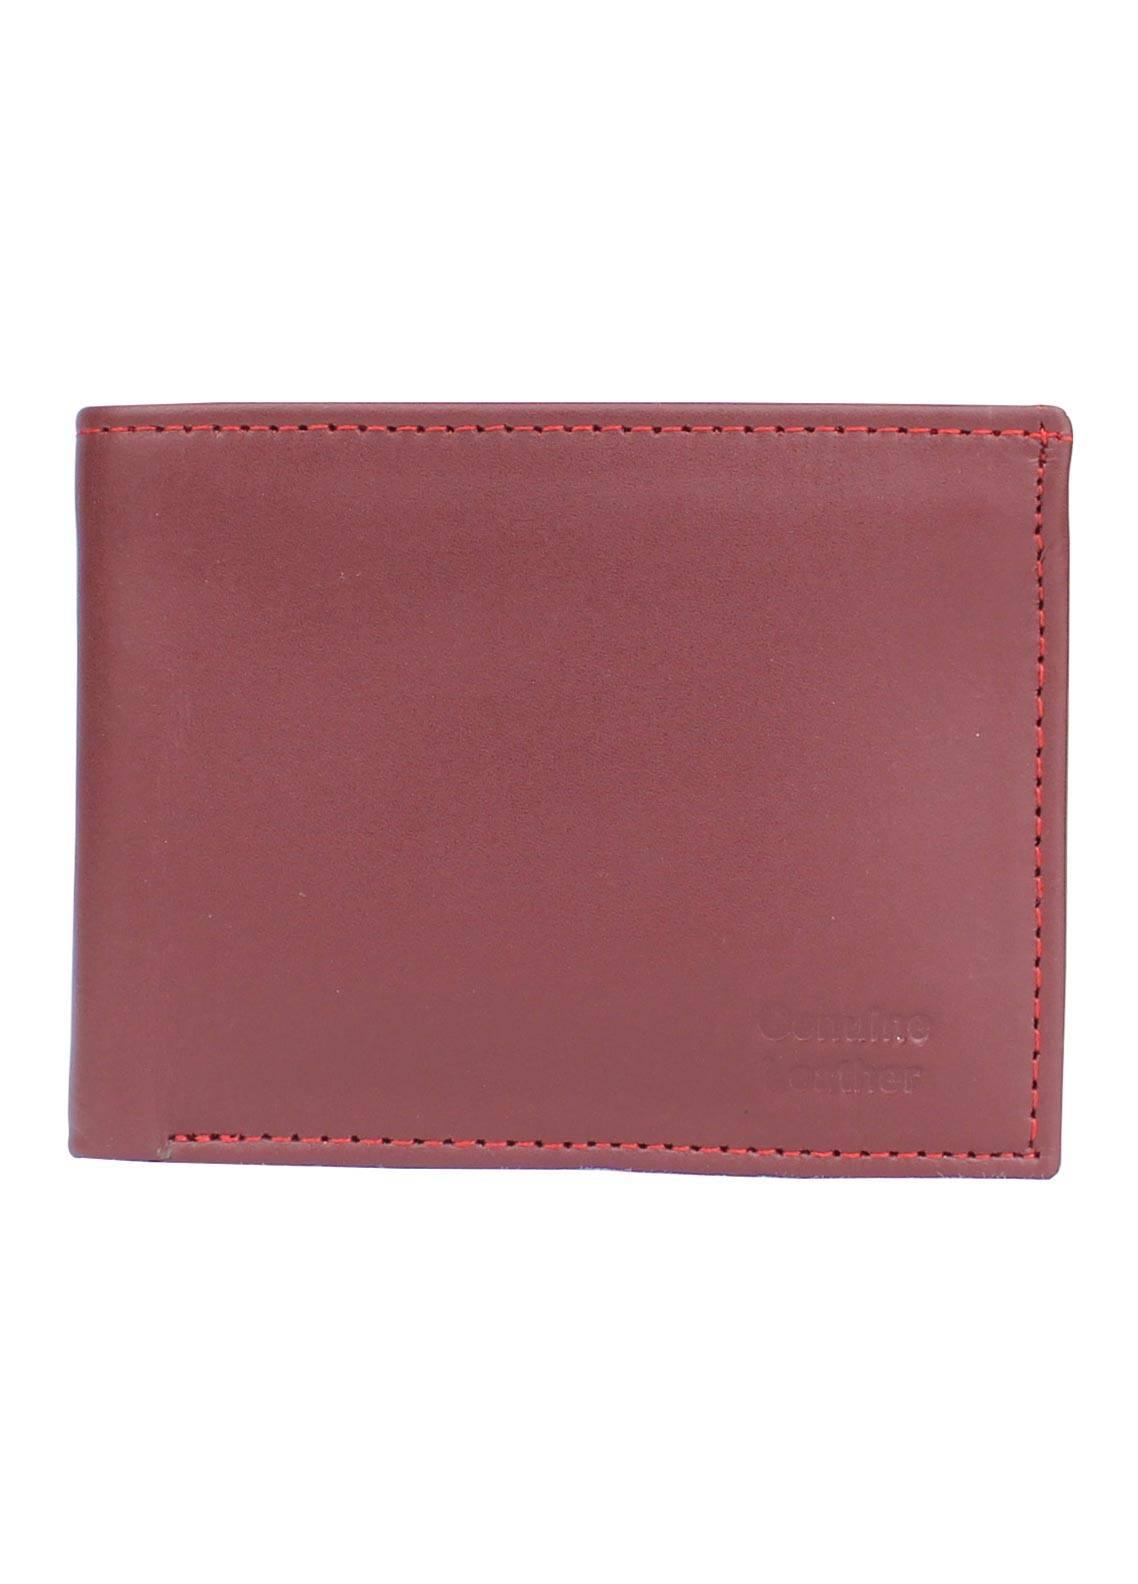 Shahzeb Saeed Plain Texture Leather Wallet W-062 - Men's Accessories